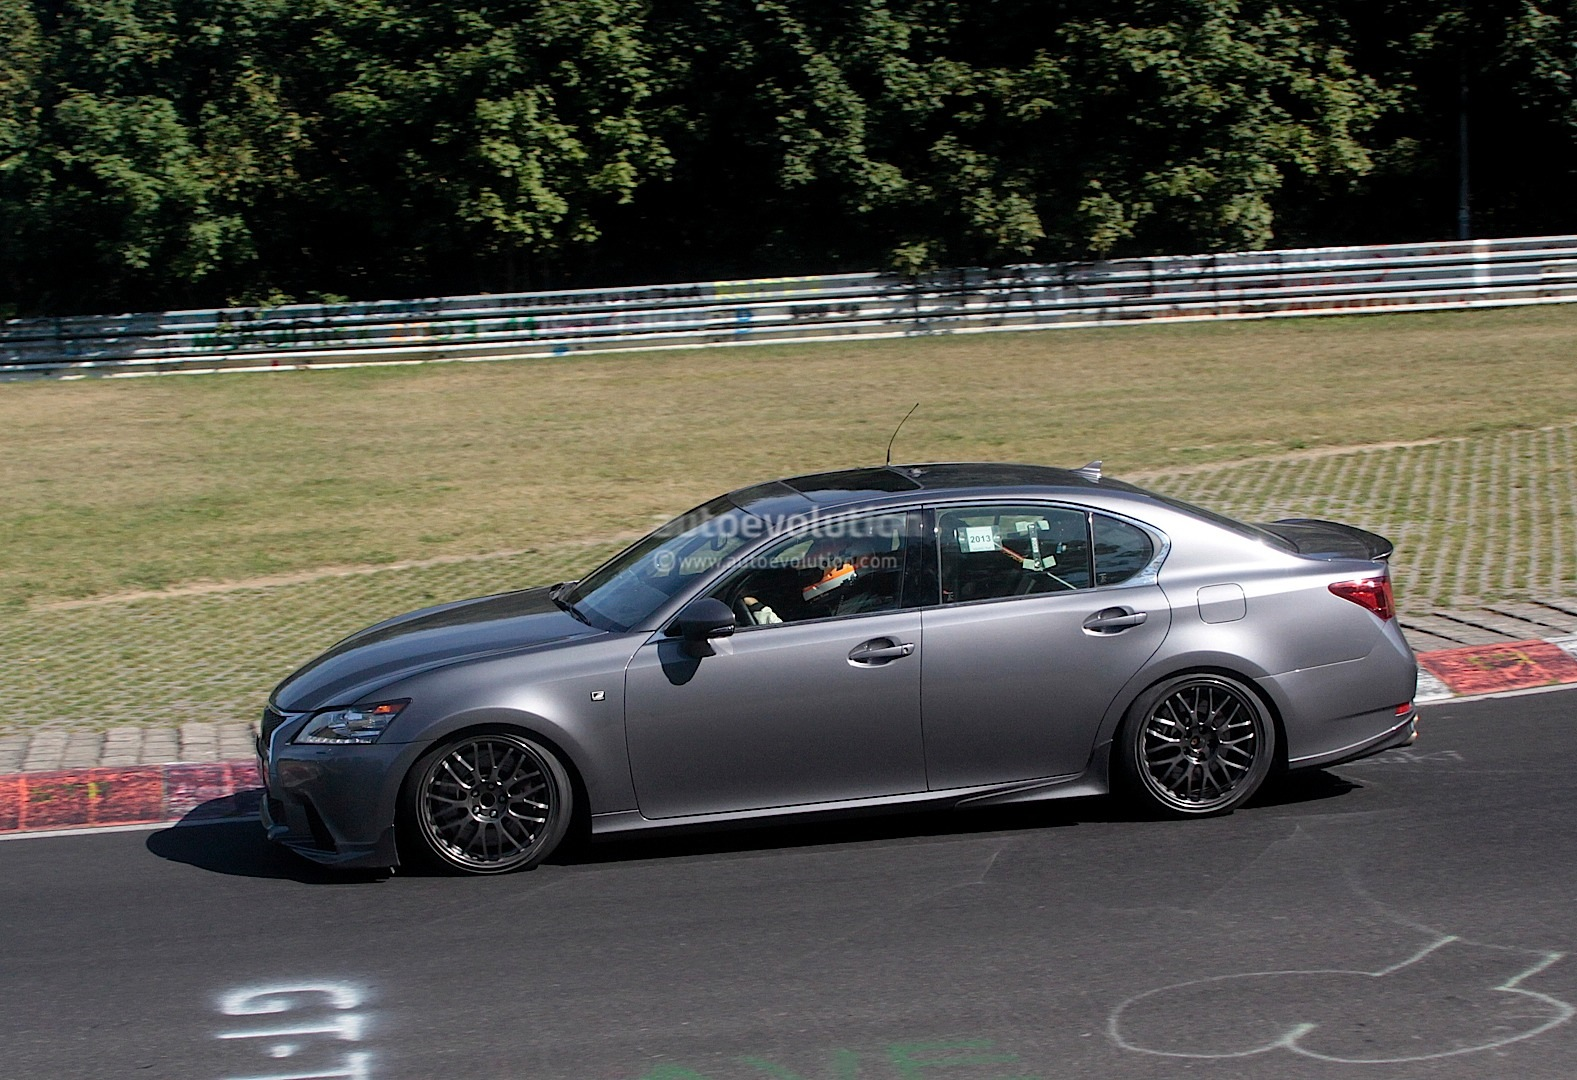 Spyshots Lexus GS F Performance Sedan Prototype Features